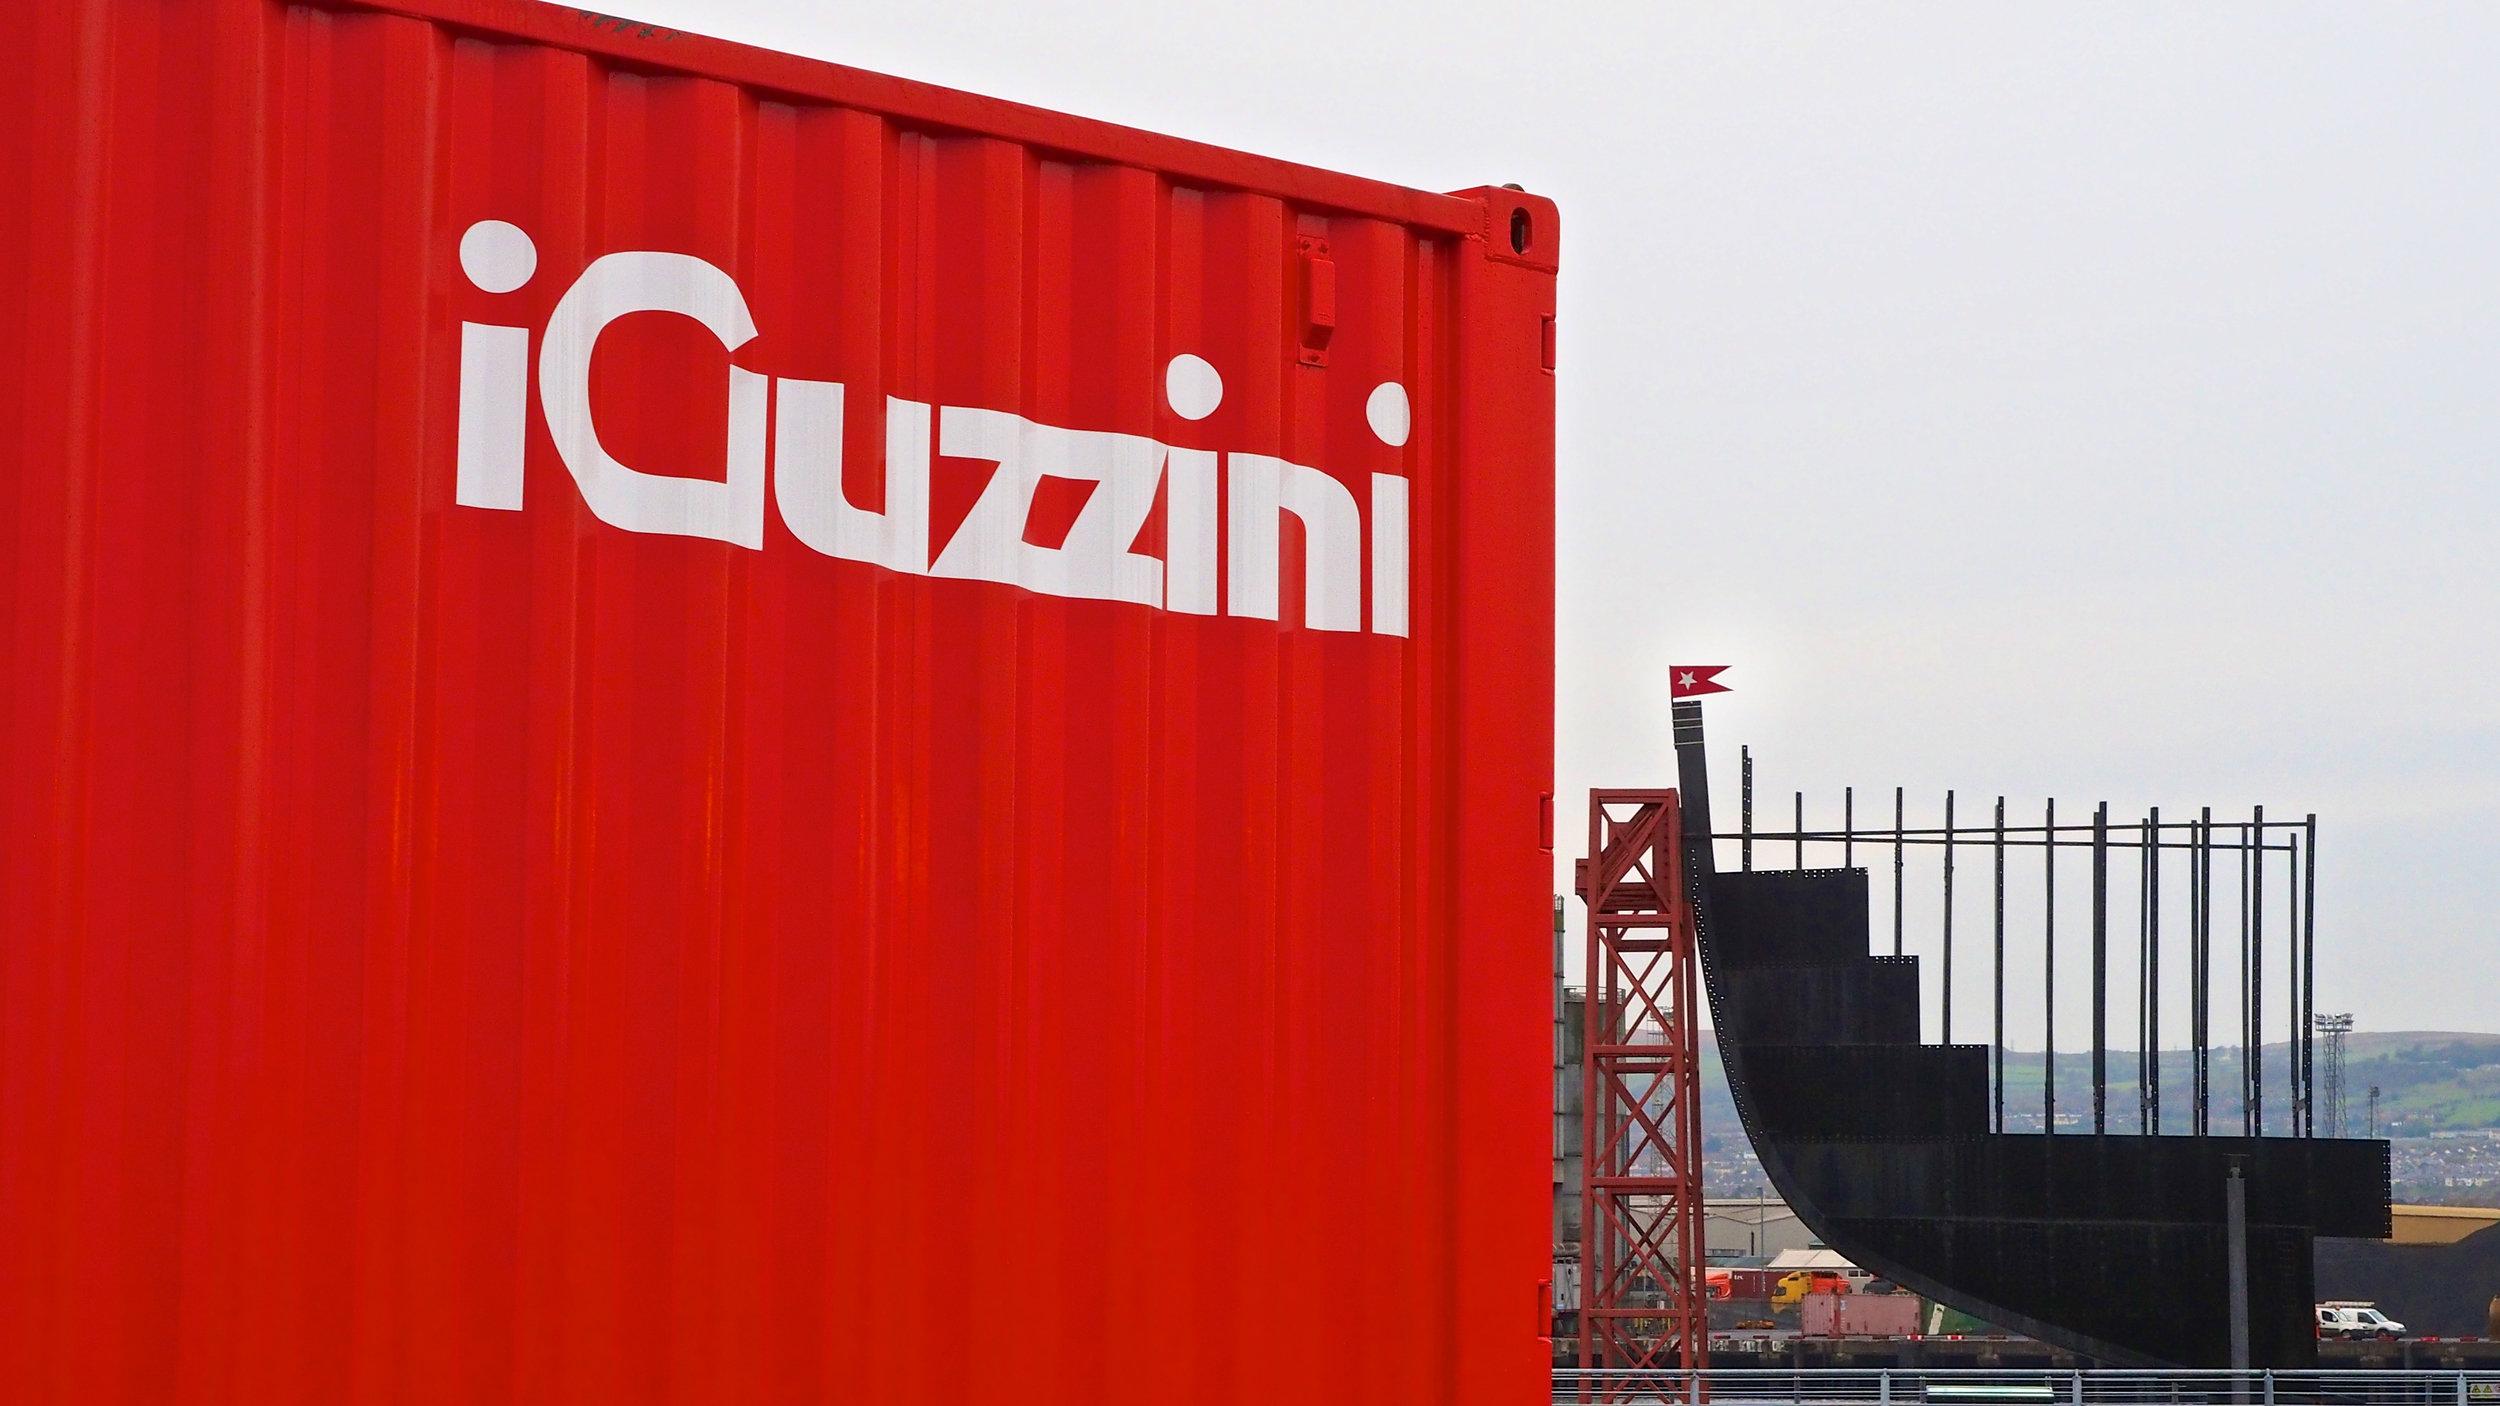 iGuzzini at the Titanic Quarter